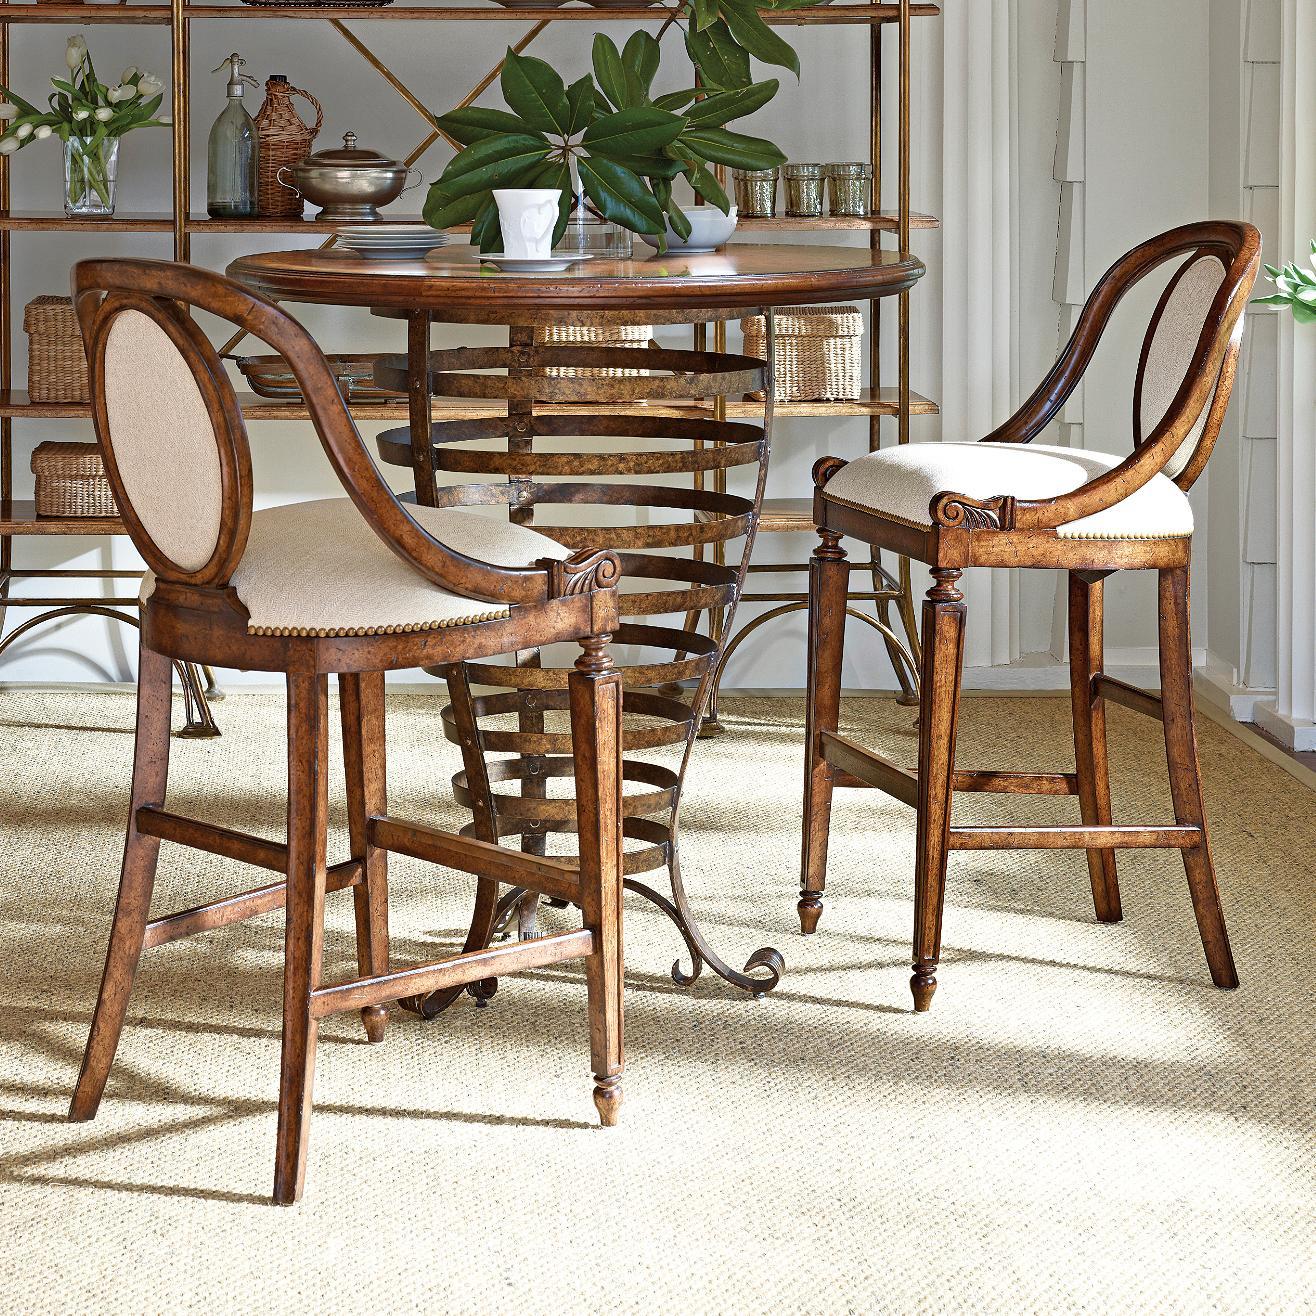 Stanley Furniture Arrondissement 3-Piece Brasserie Pub Table Set - Item Number: 222-11-34+2x73